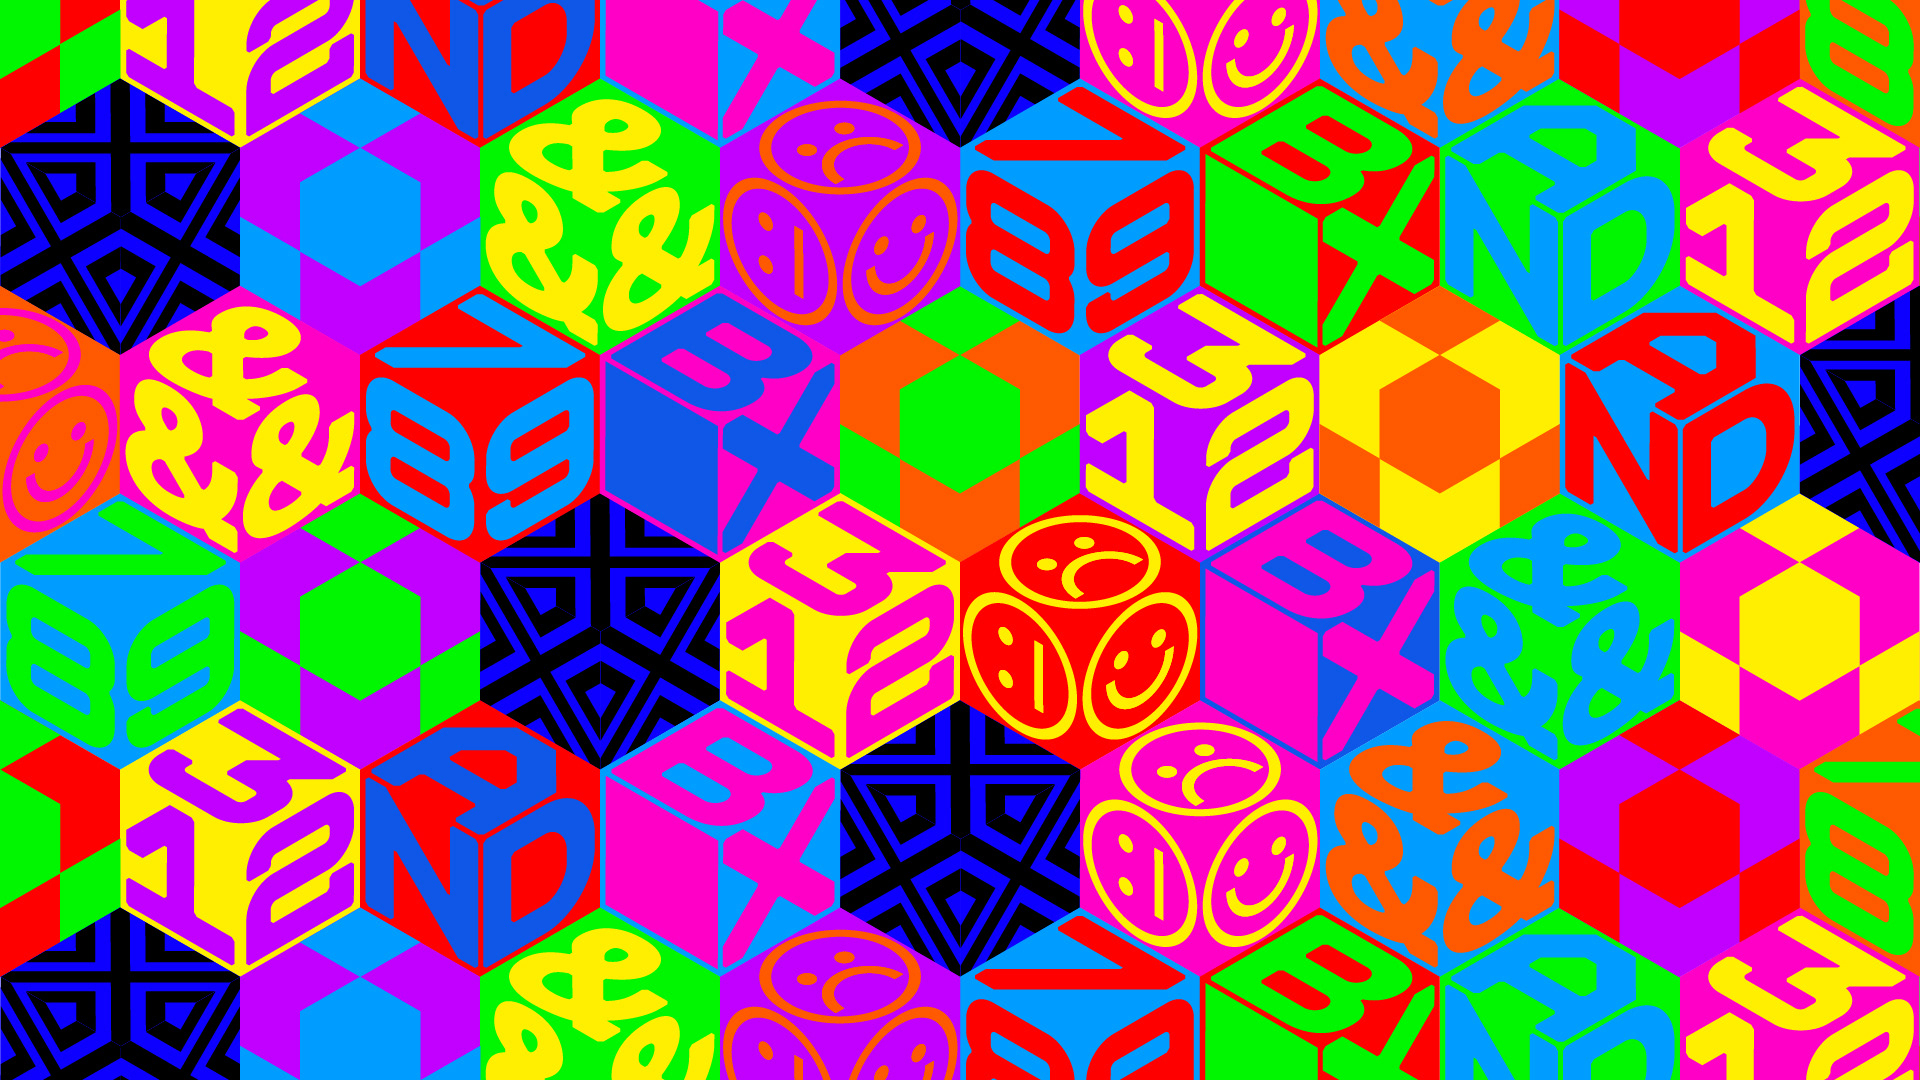 Matthijs Matt van Leeuwen Mother Design Andbox Maxwell Osborne Identity Pattern